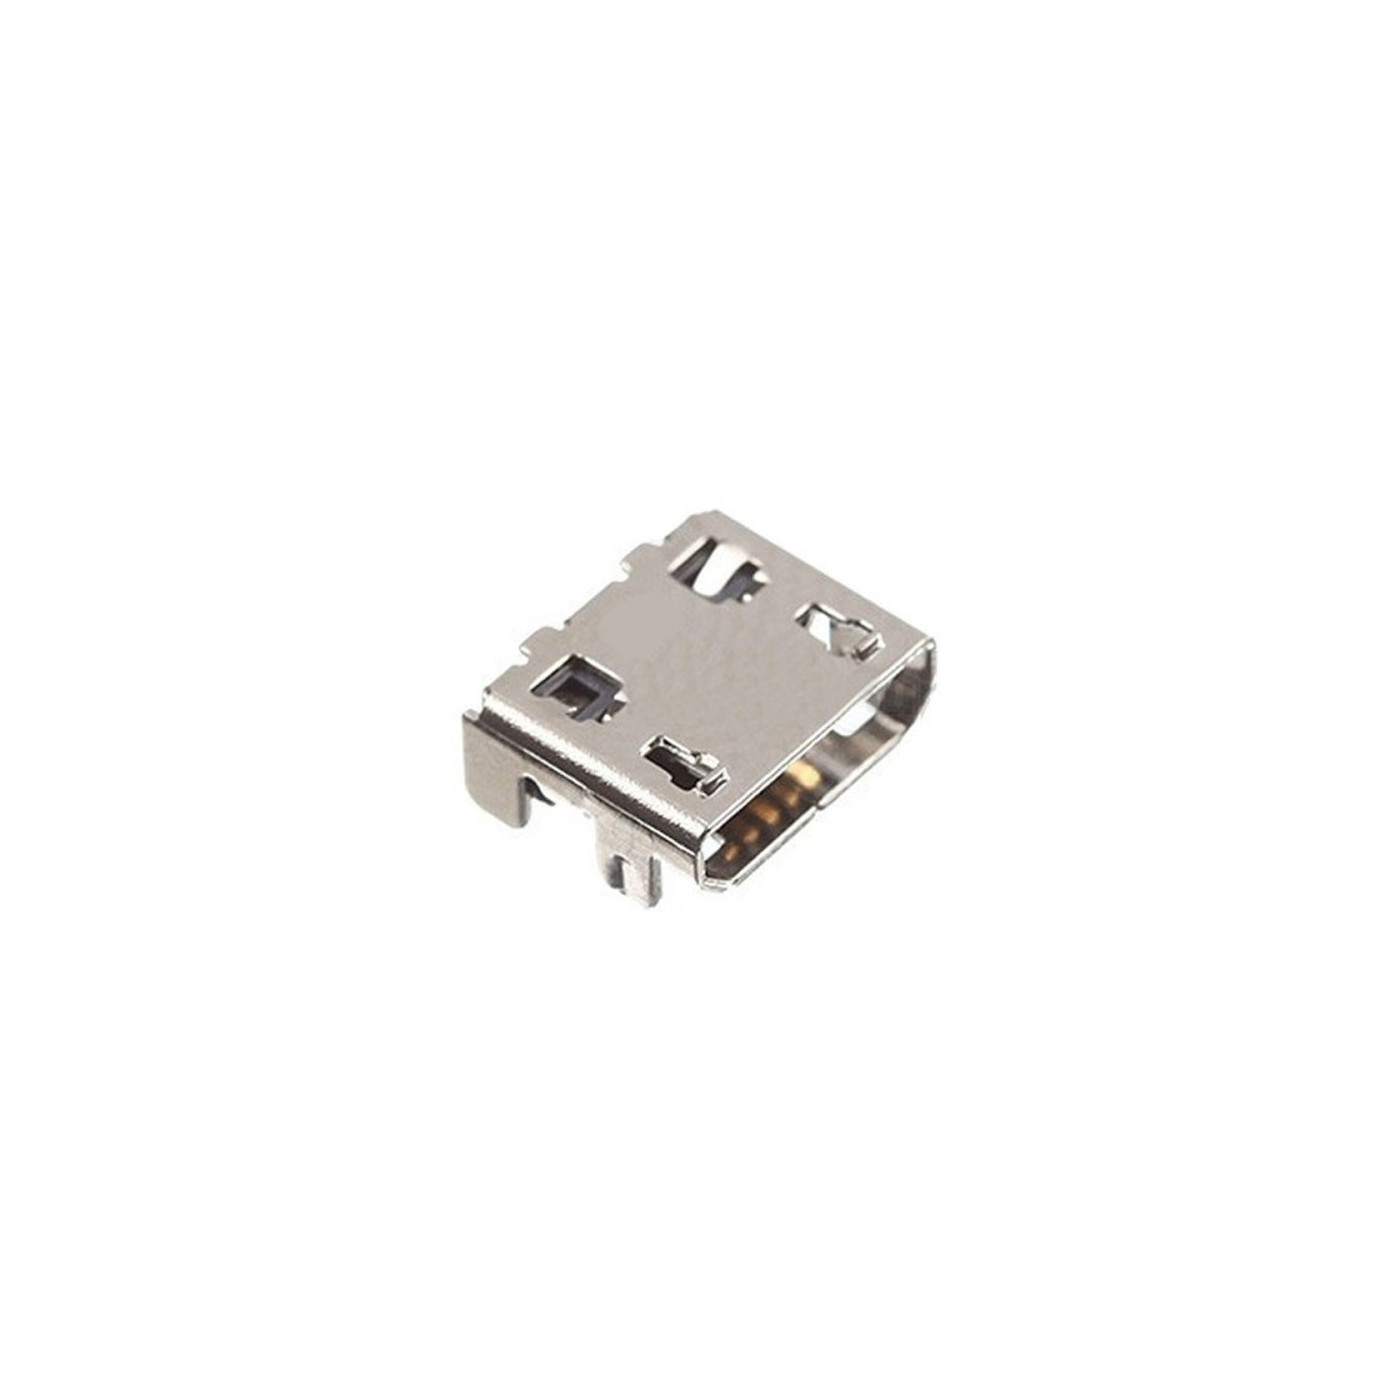 Ladeanschluss Micro USB Ladedaten Port für LG Google Nexus 4 - E960